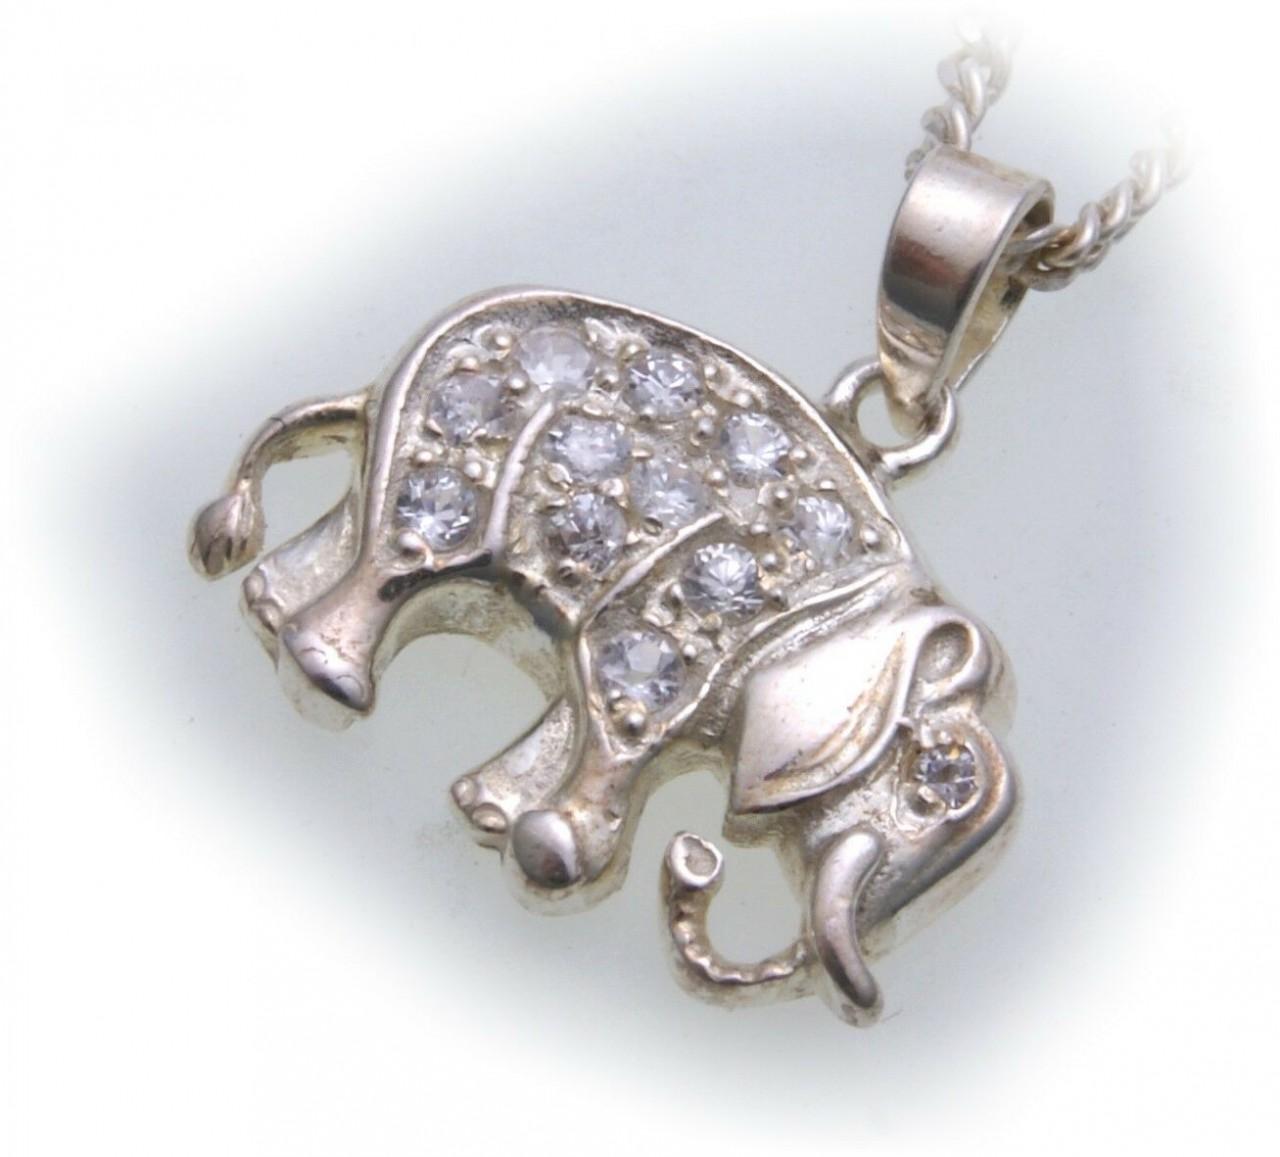 Anhänger echt Silber 925 Elefant mit Zirkonia gefasst Sterlingsilber Unisex